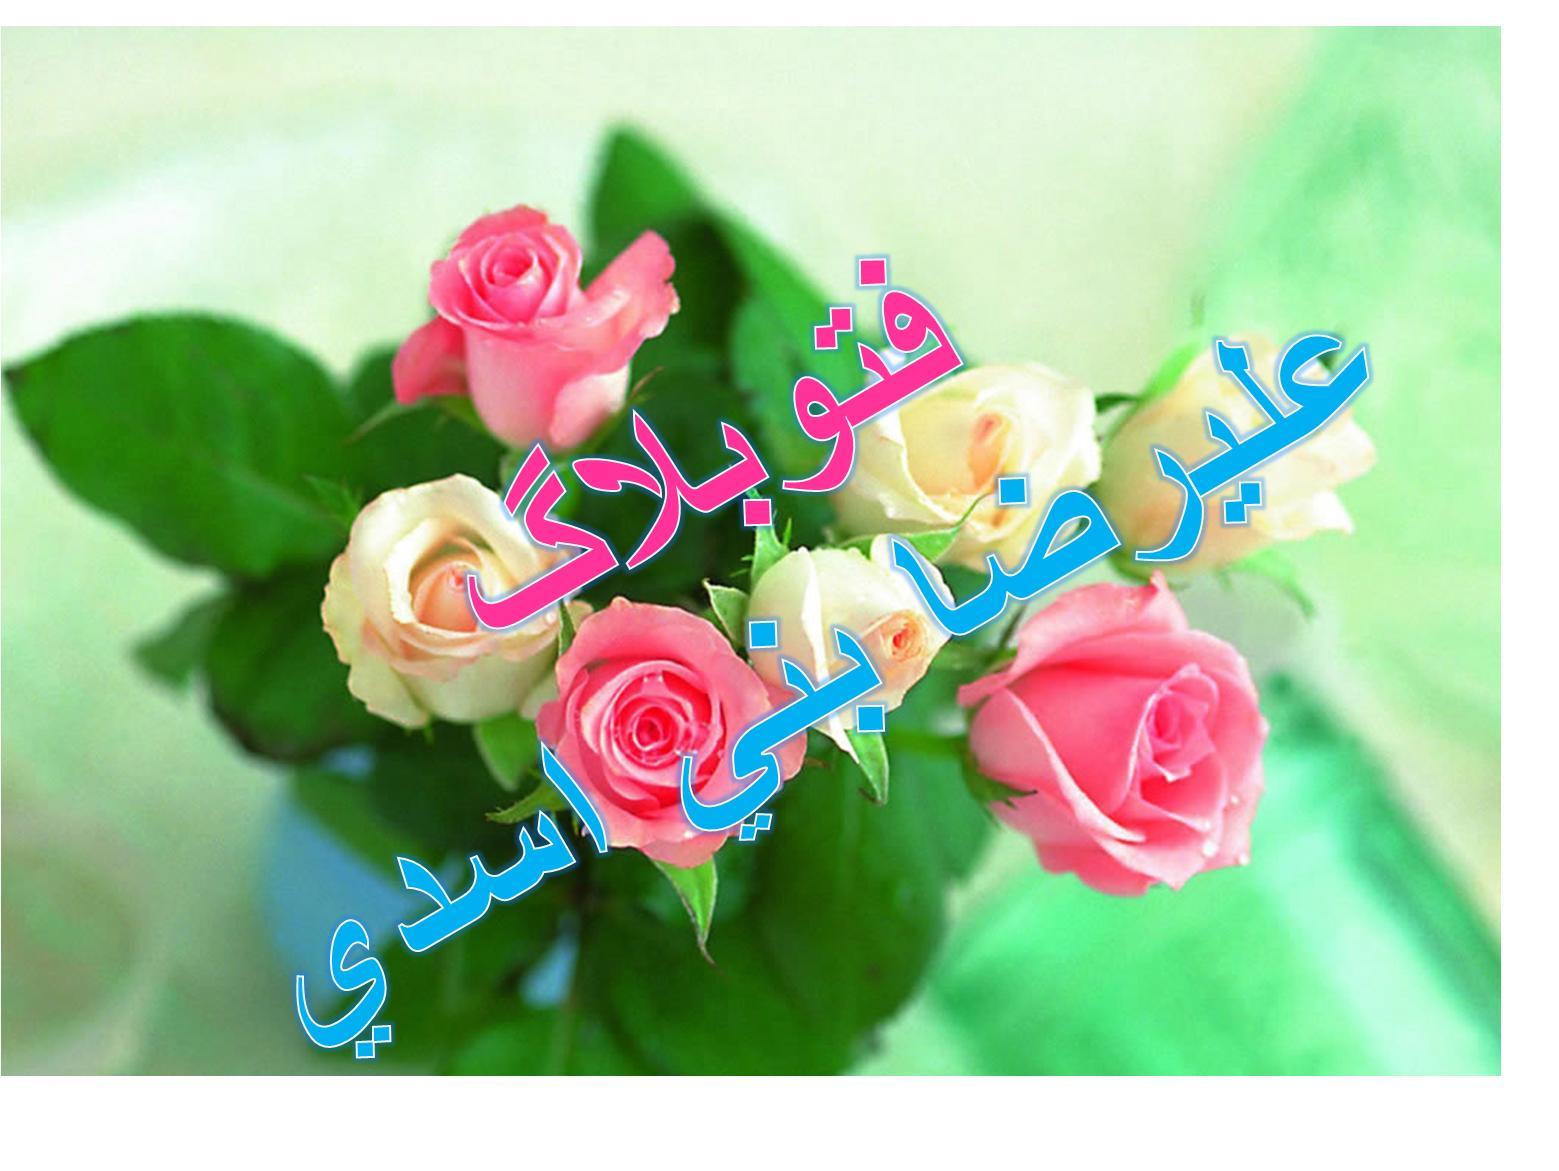 فتوبلاگ عليرضا بني اسدي